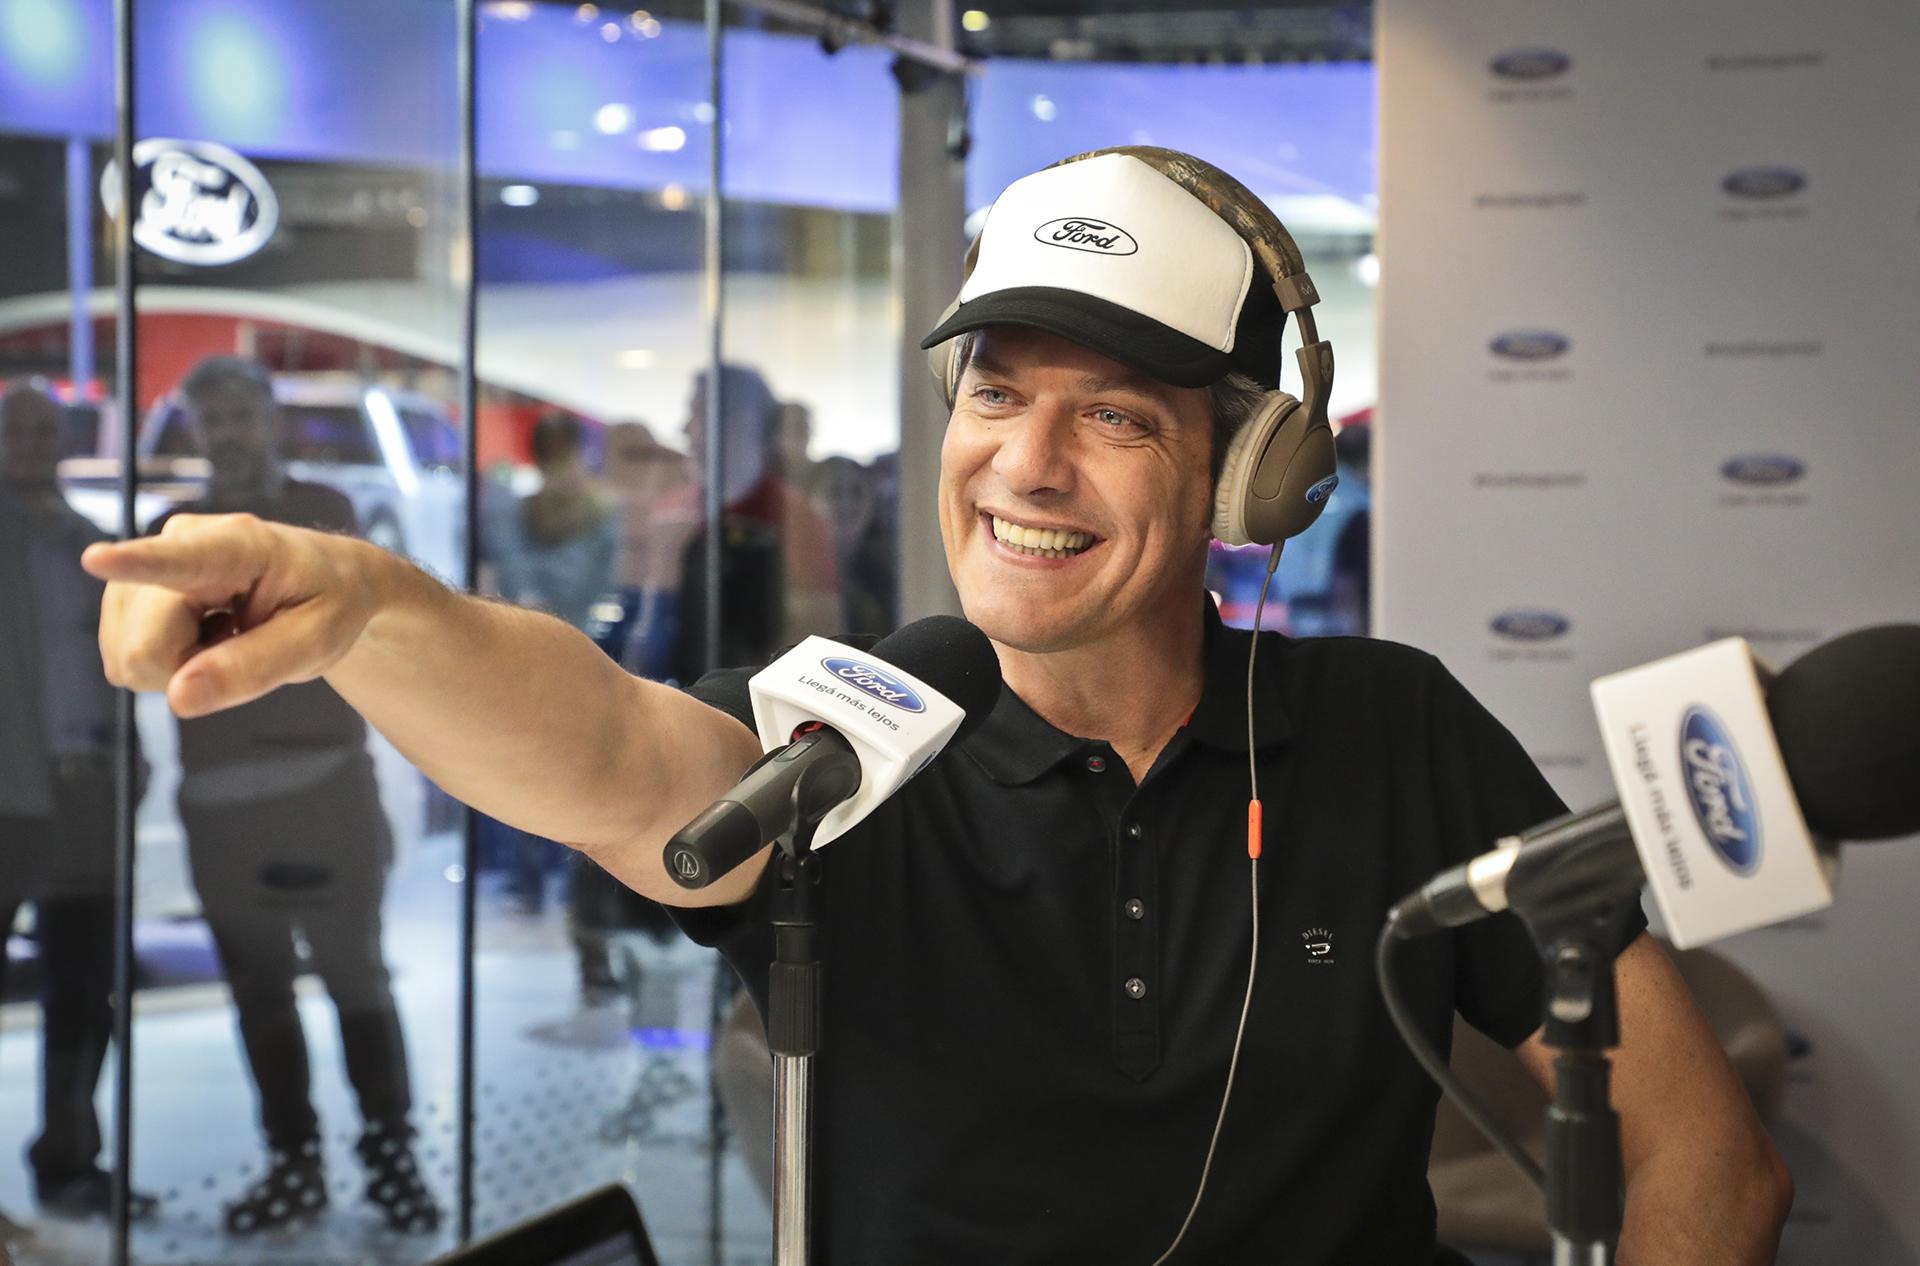 Mario Pergolini en Ford Live Studio